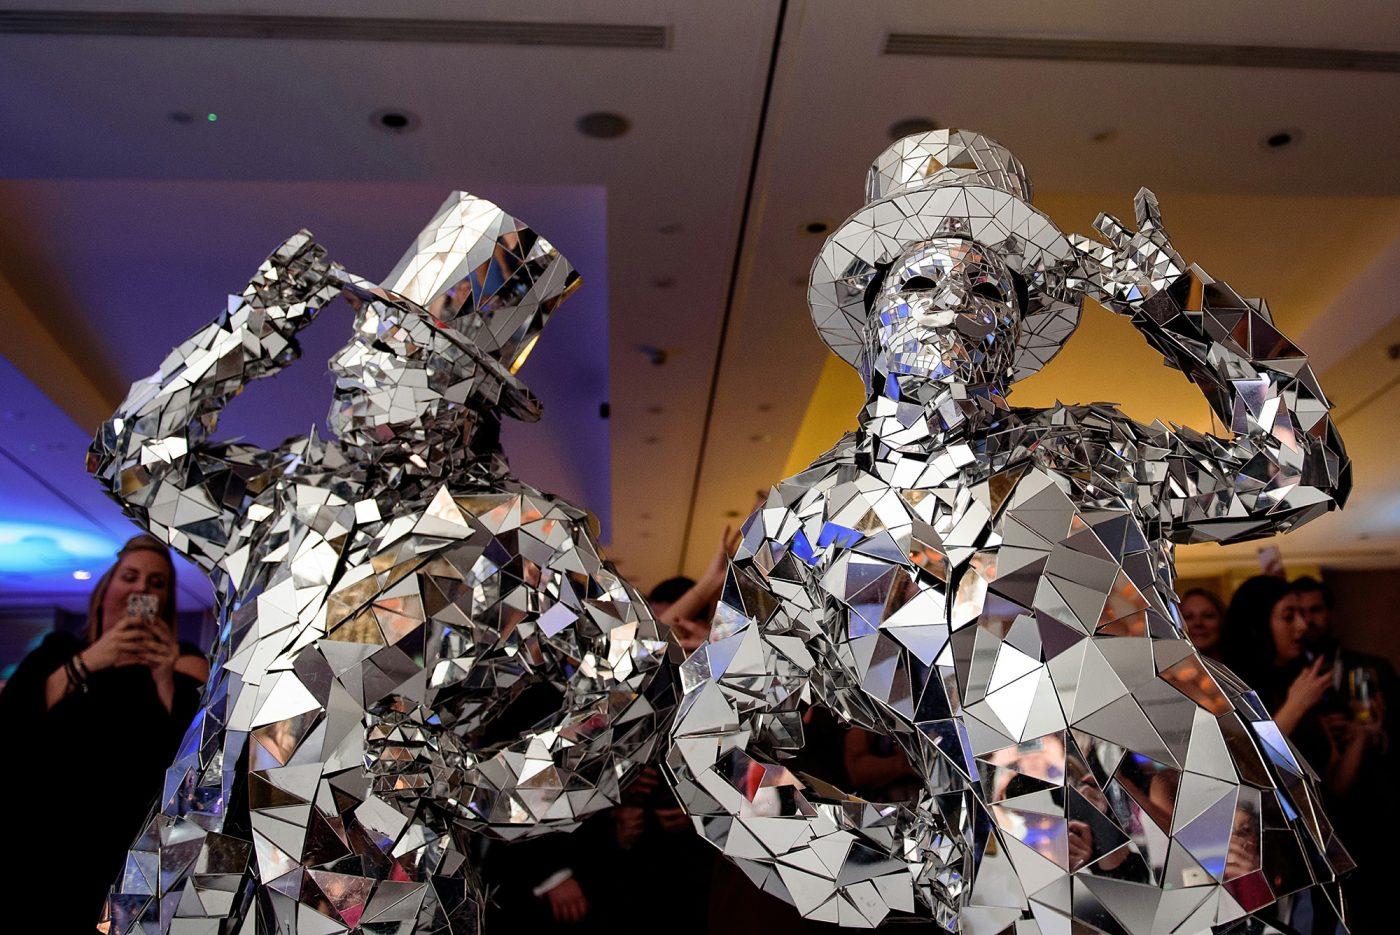 mirror men at quirky watford wedding